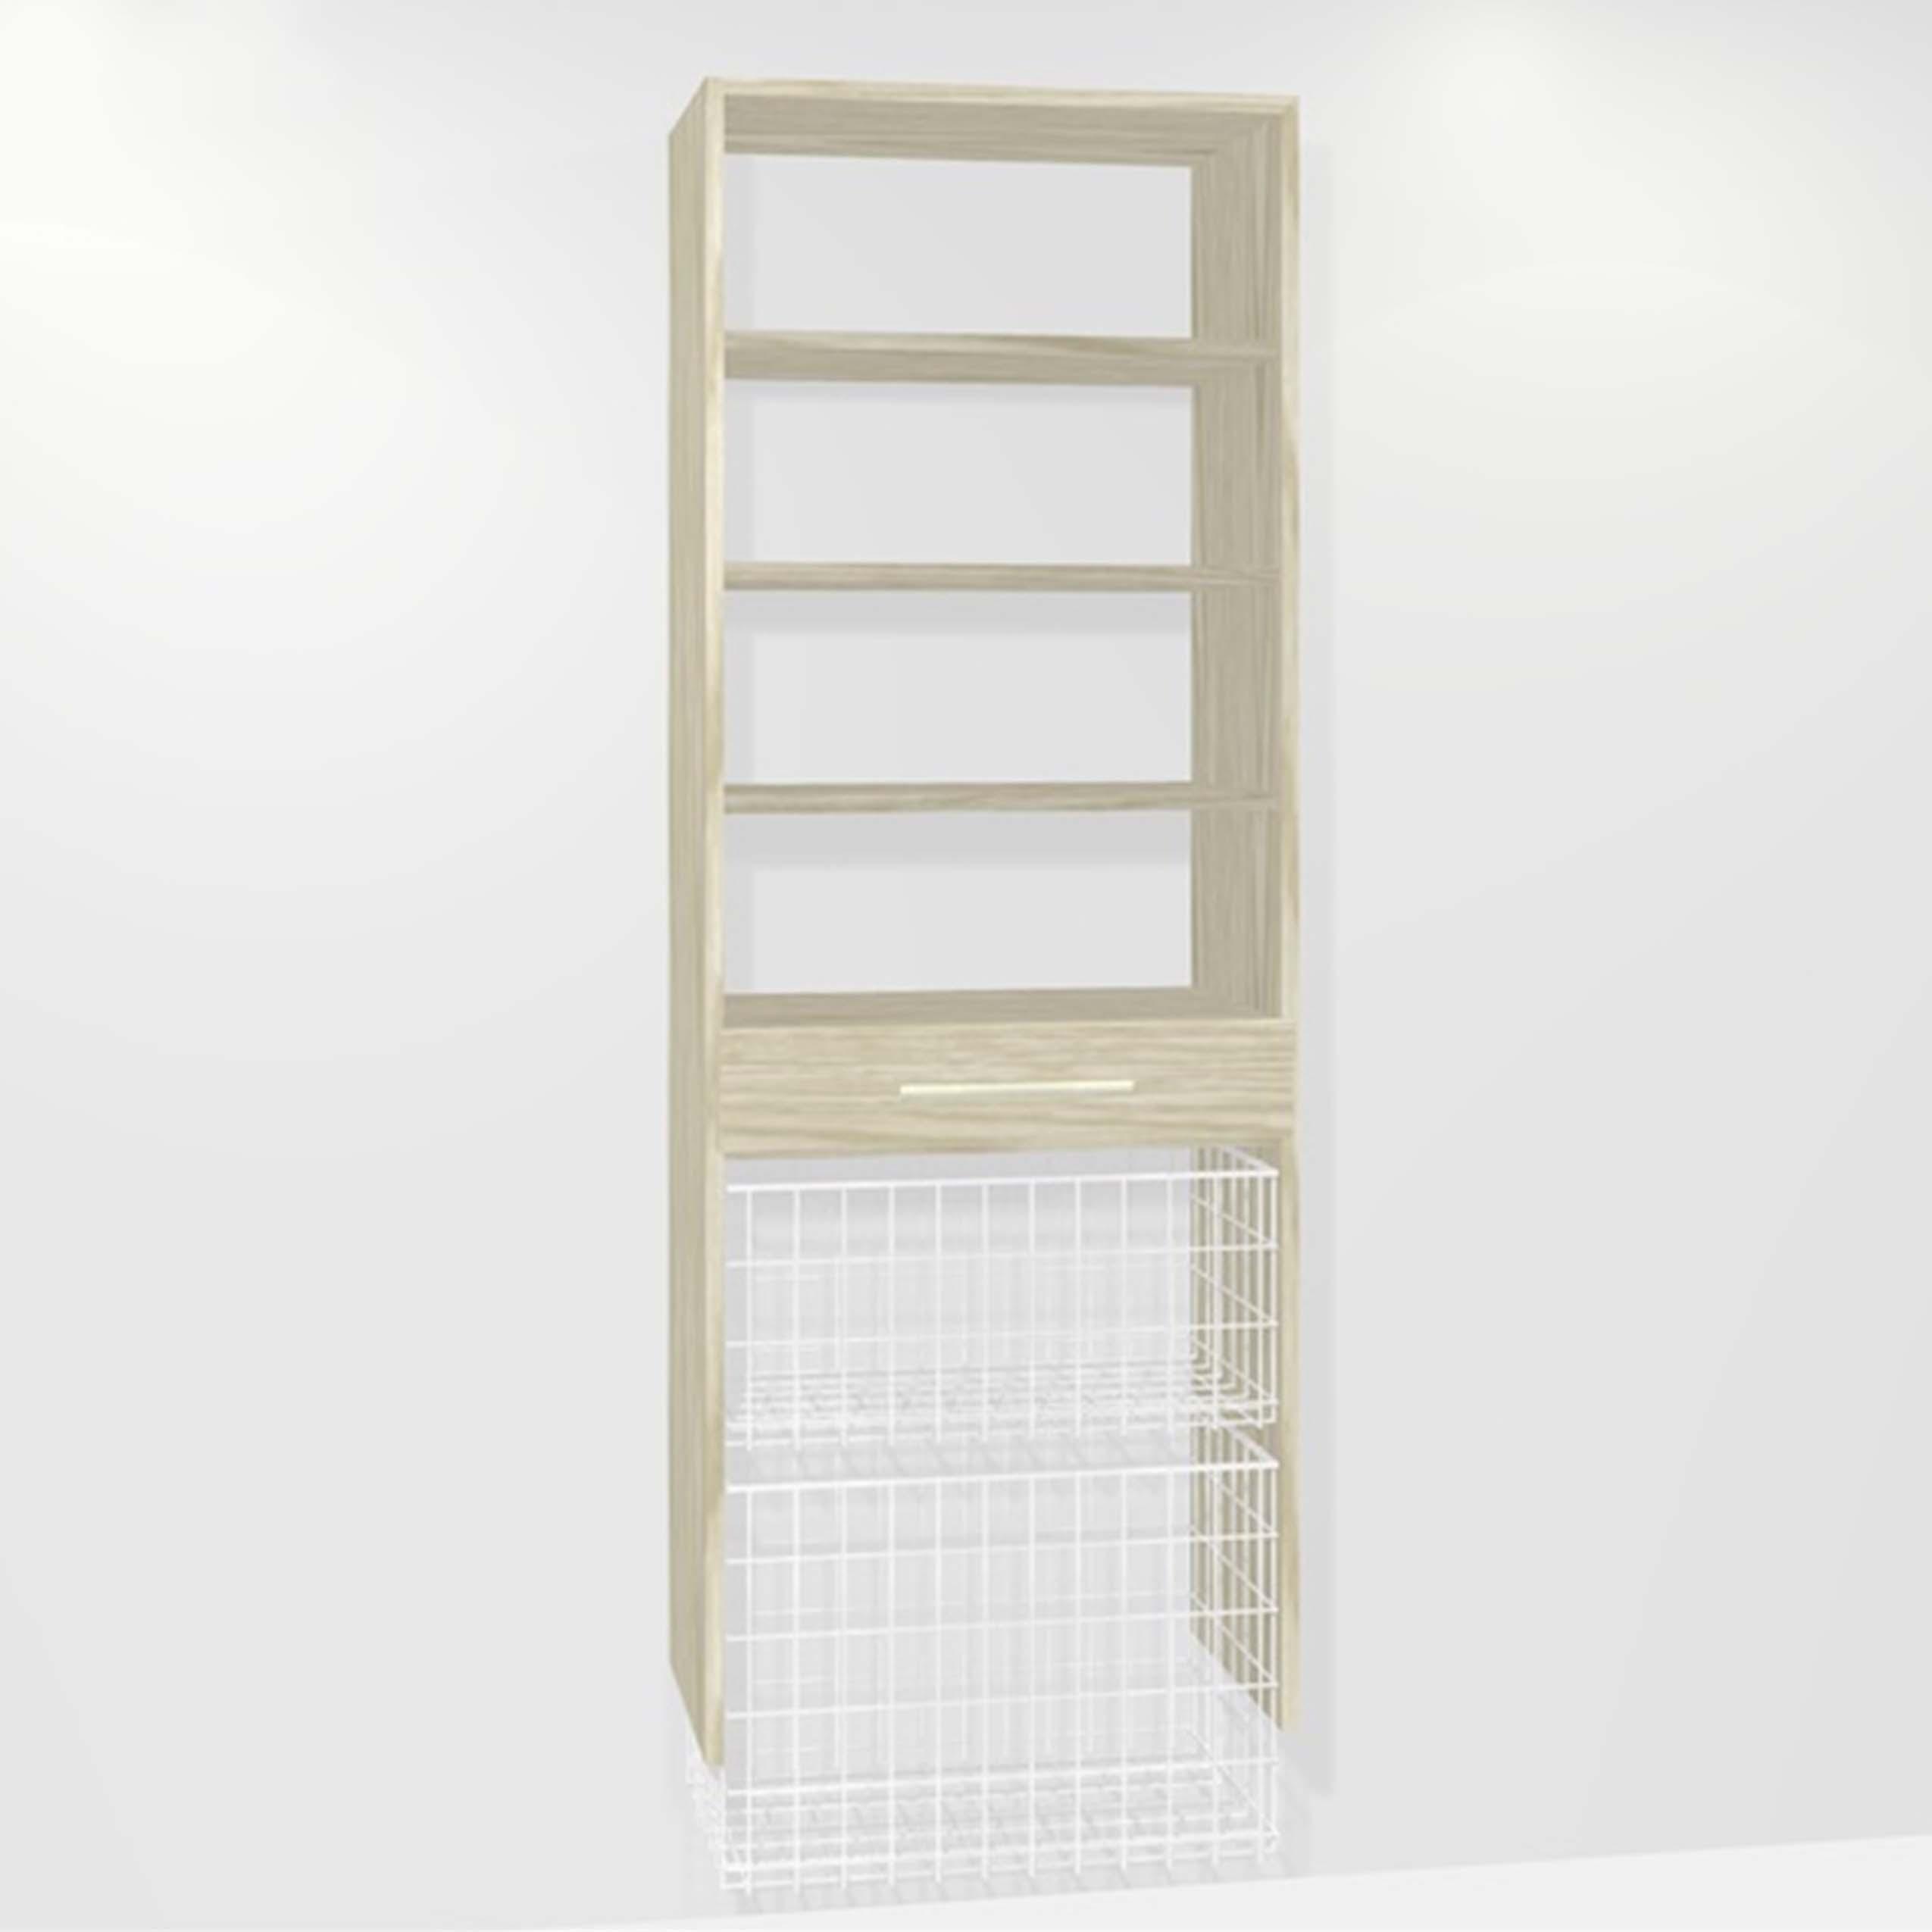 KCD Image closet